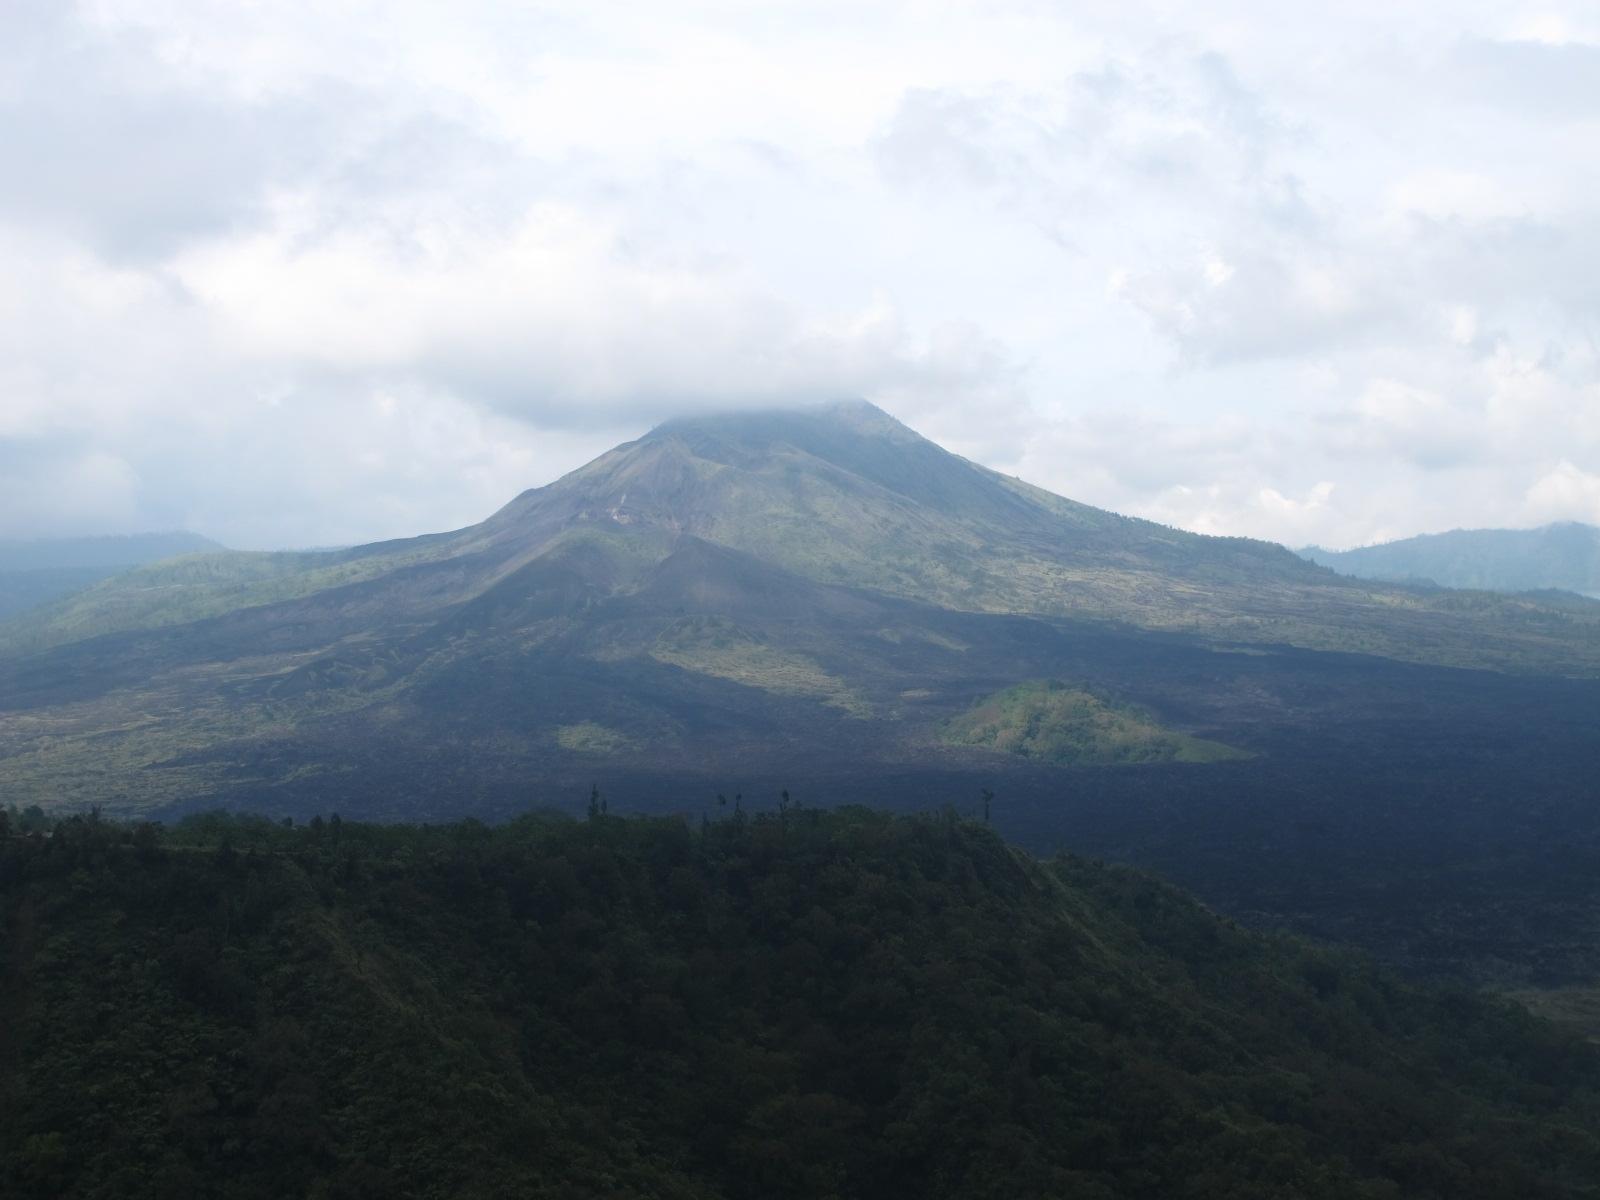 Mount Kintamani